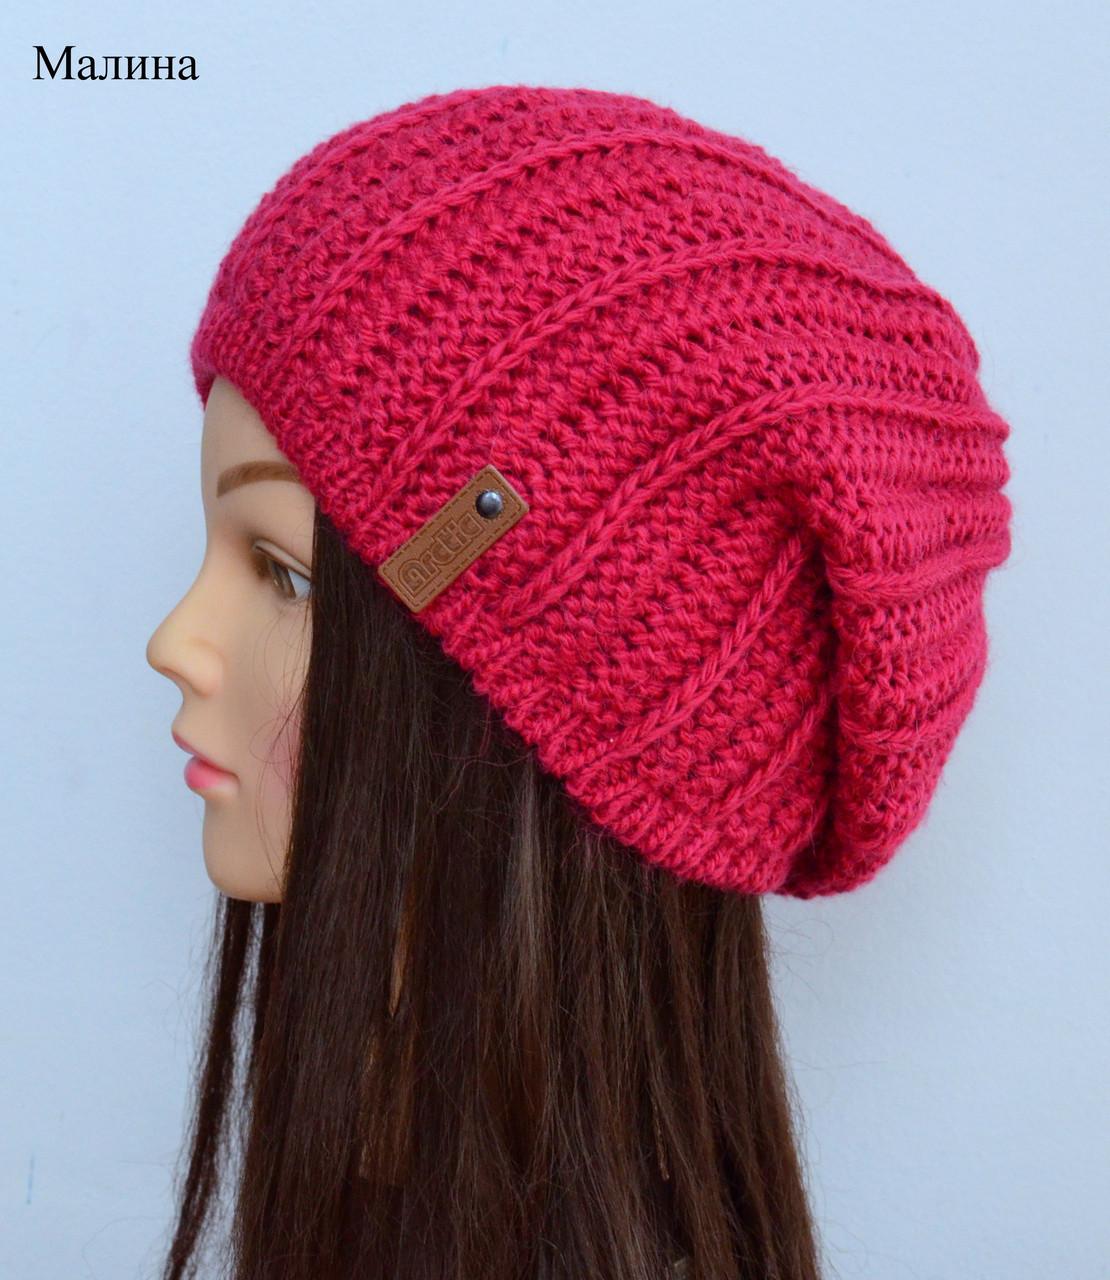 Вязаная зимняя шапка женская